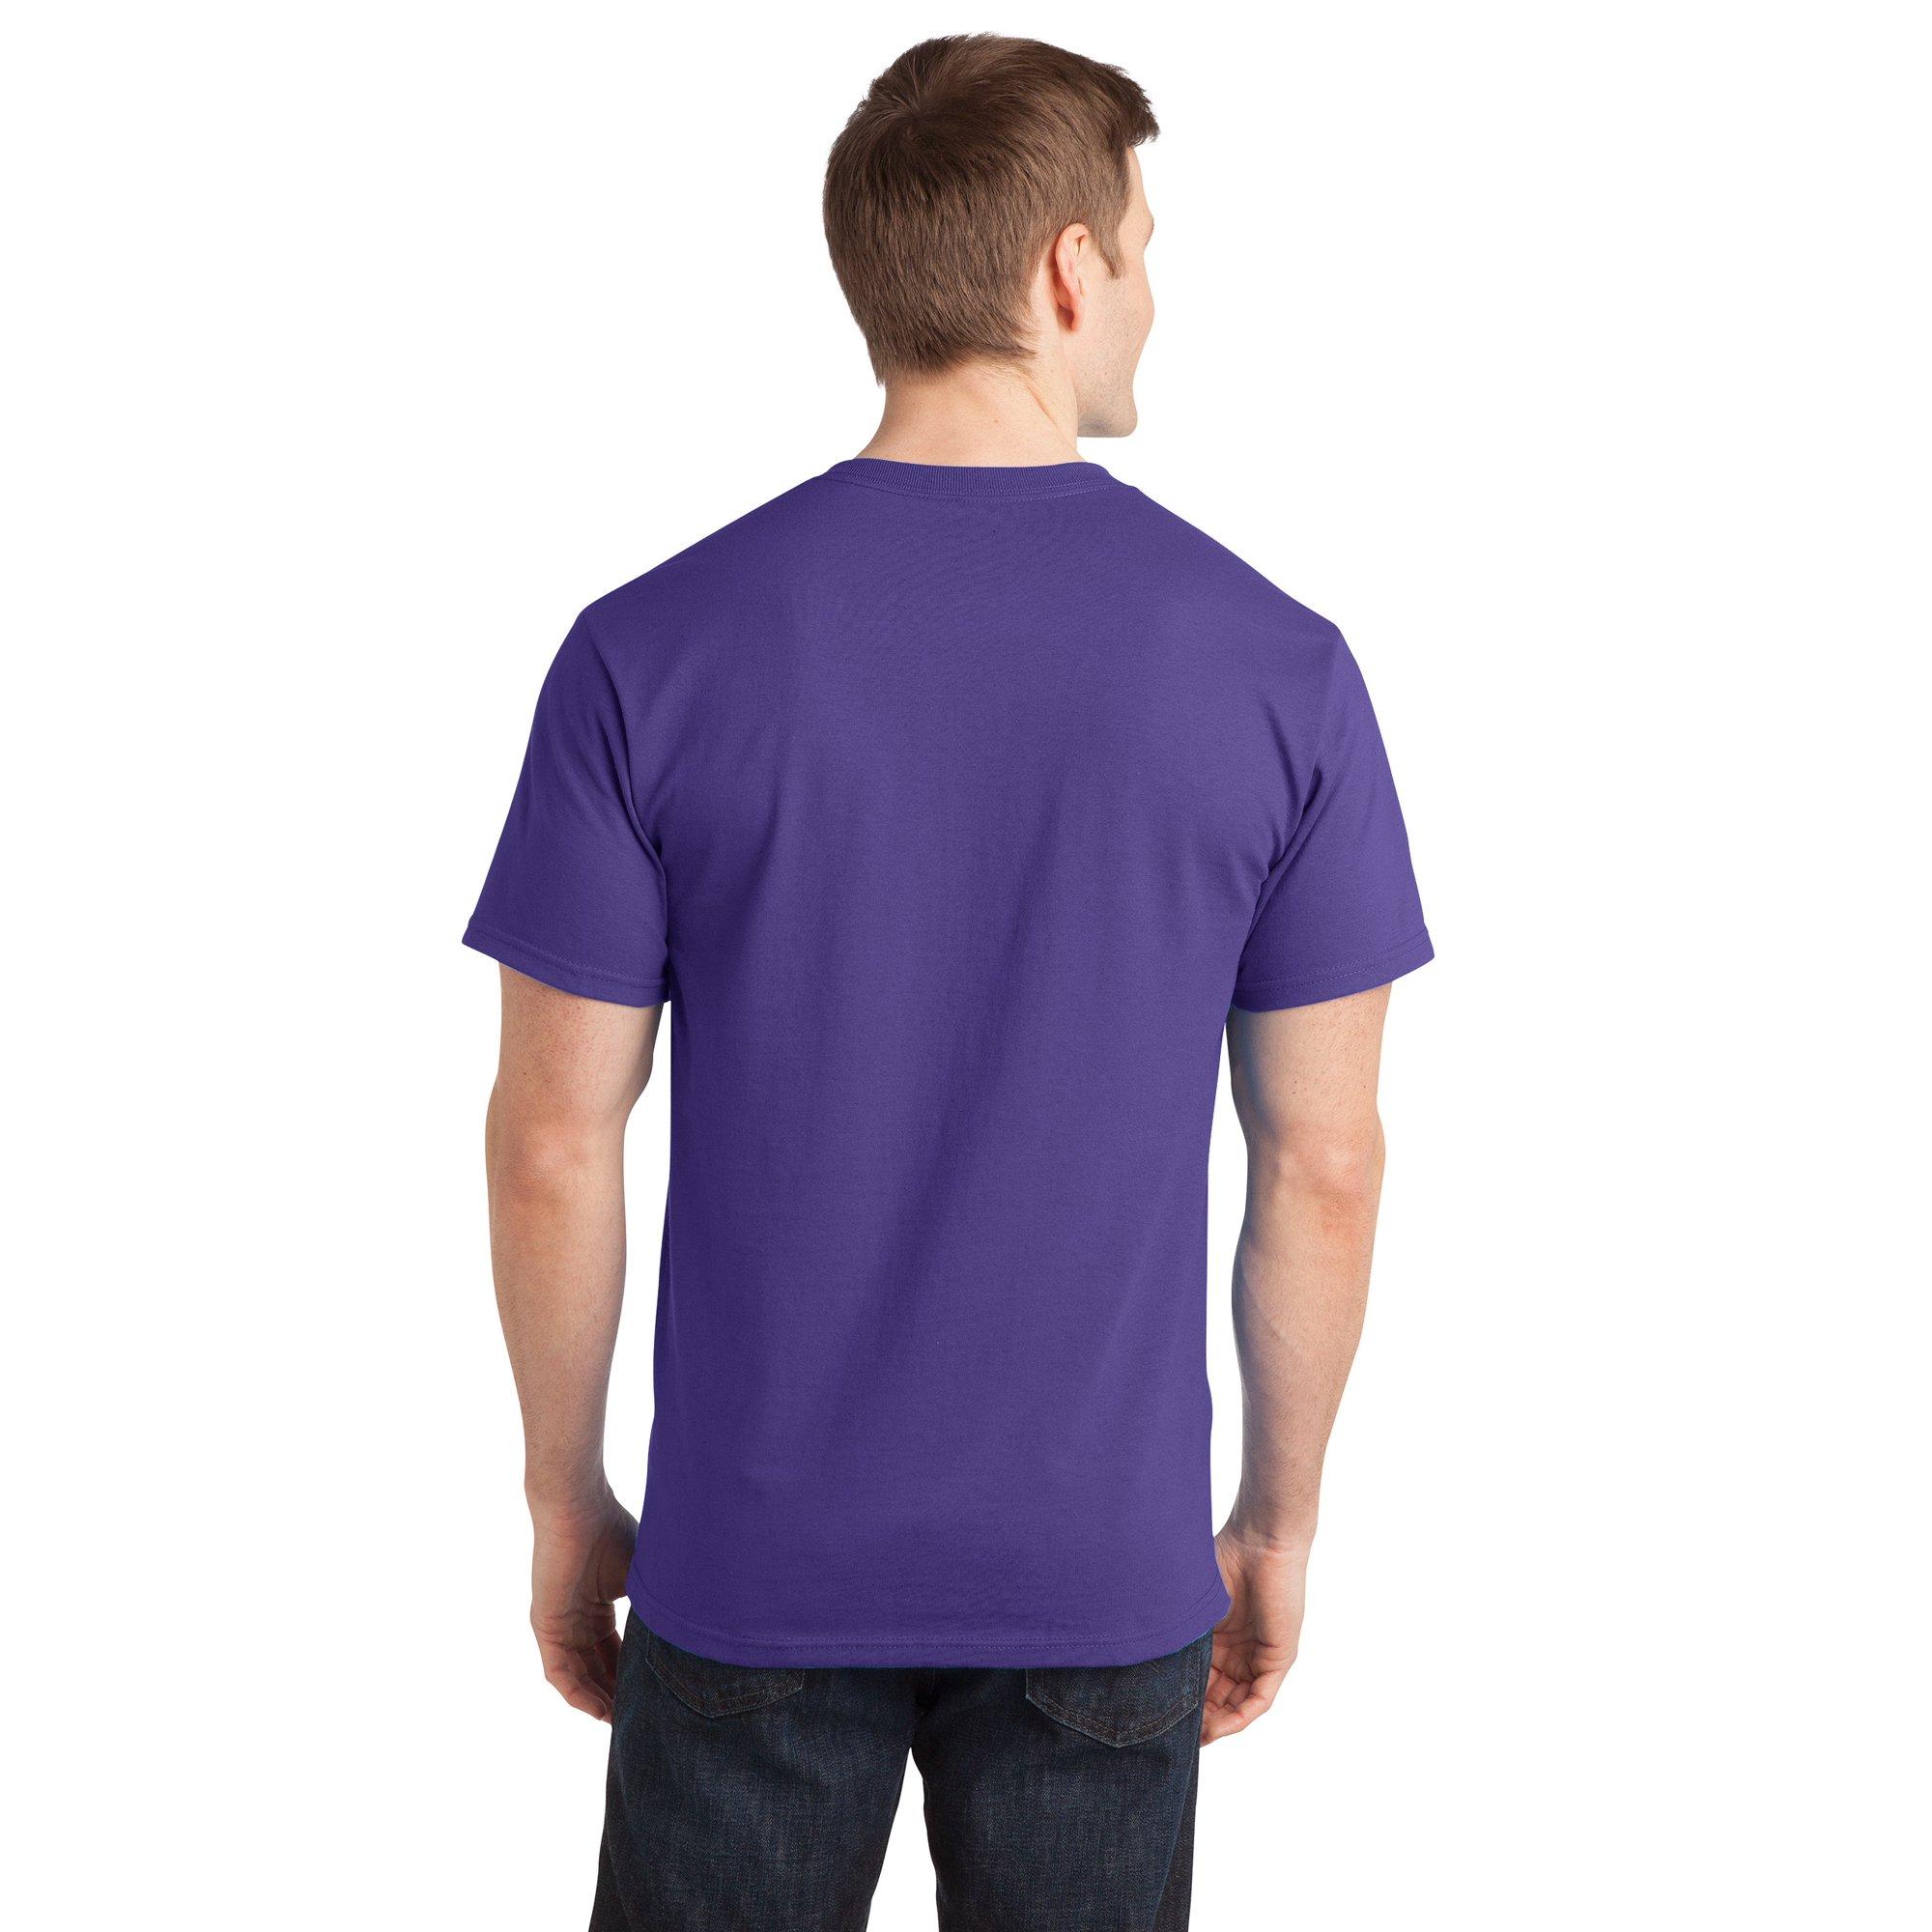 c8641aa0a Sportoli Men's Essential Basic 100% Cotton Crew Neck Short Sleeve Long T- Shirt